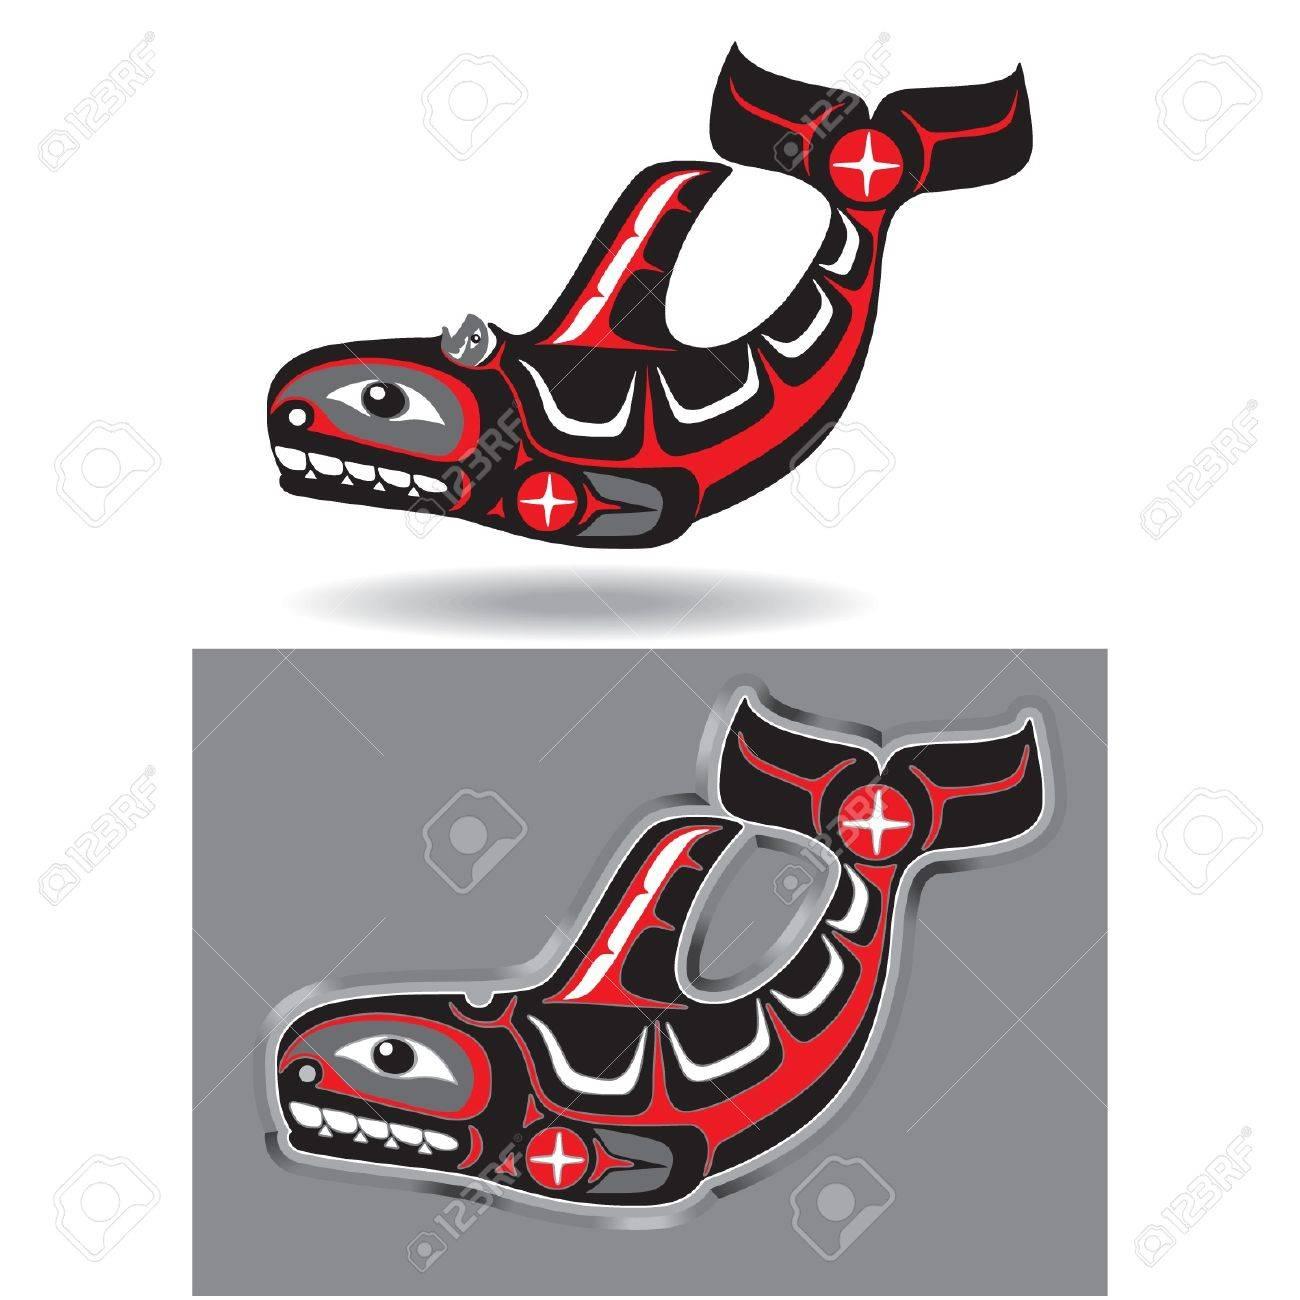 Orca (Killer Whale) in Native Art Style Stock Vector - 11113900